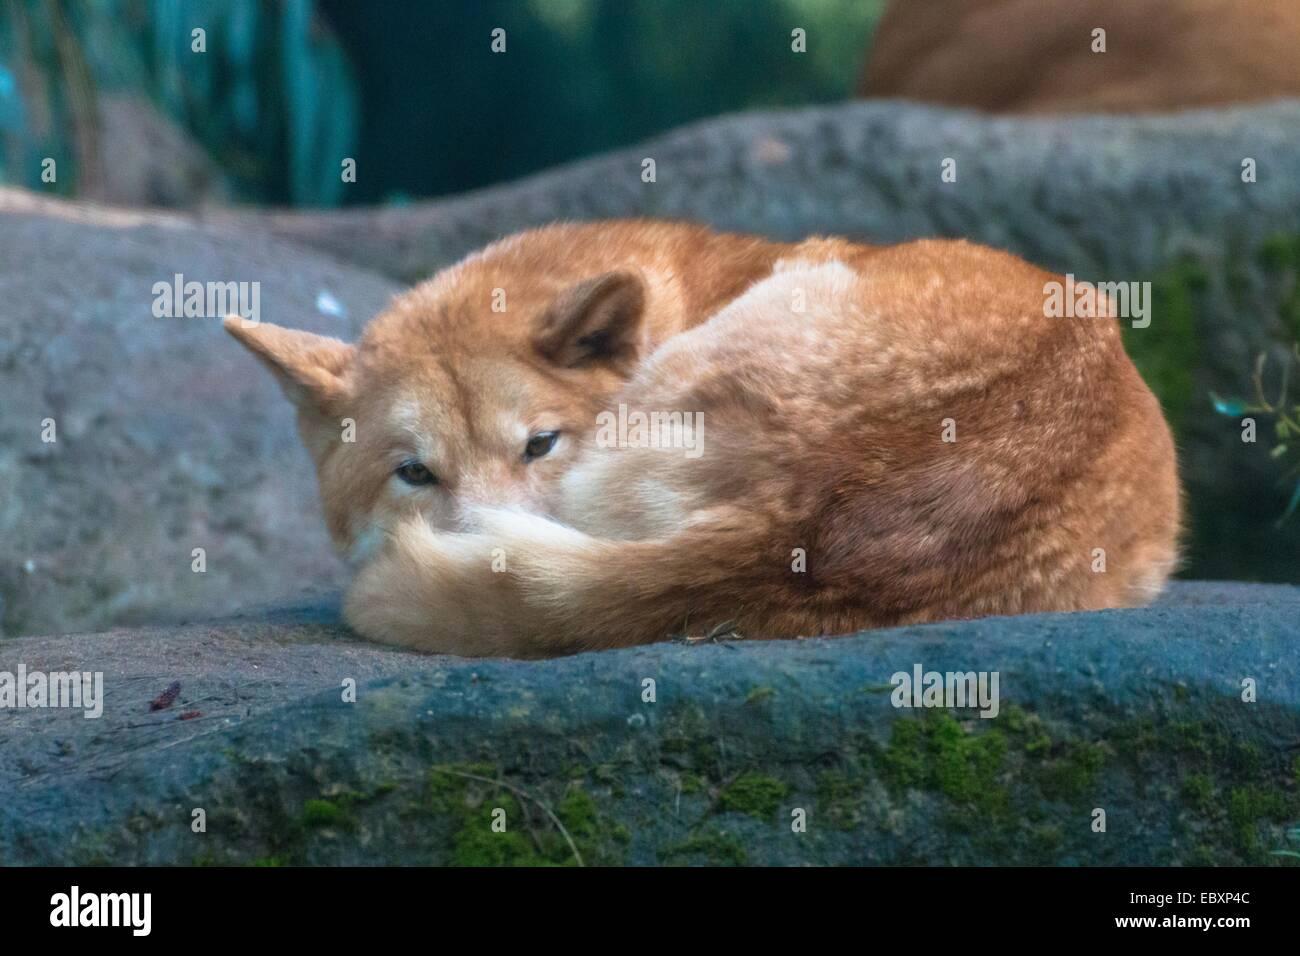 60 Jahre alte Cougars